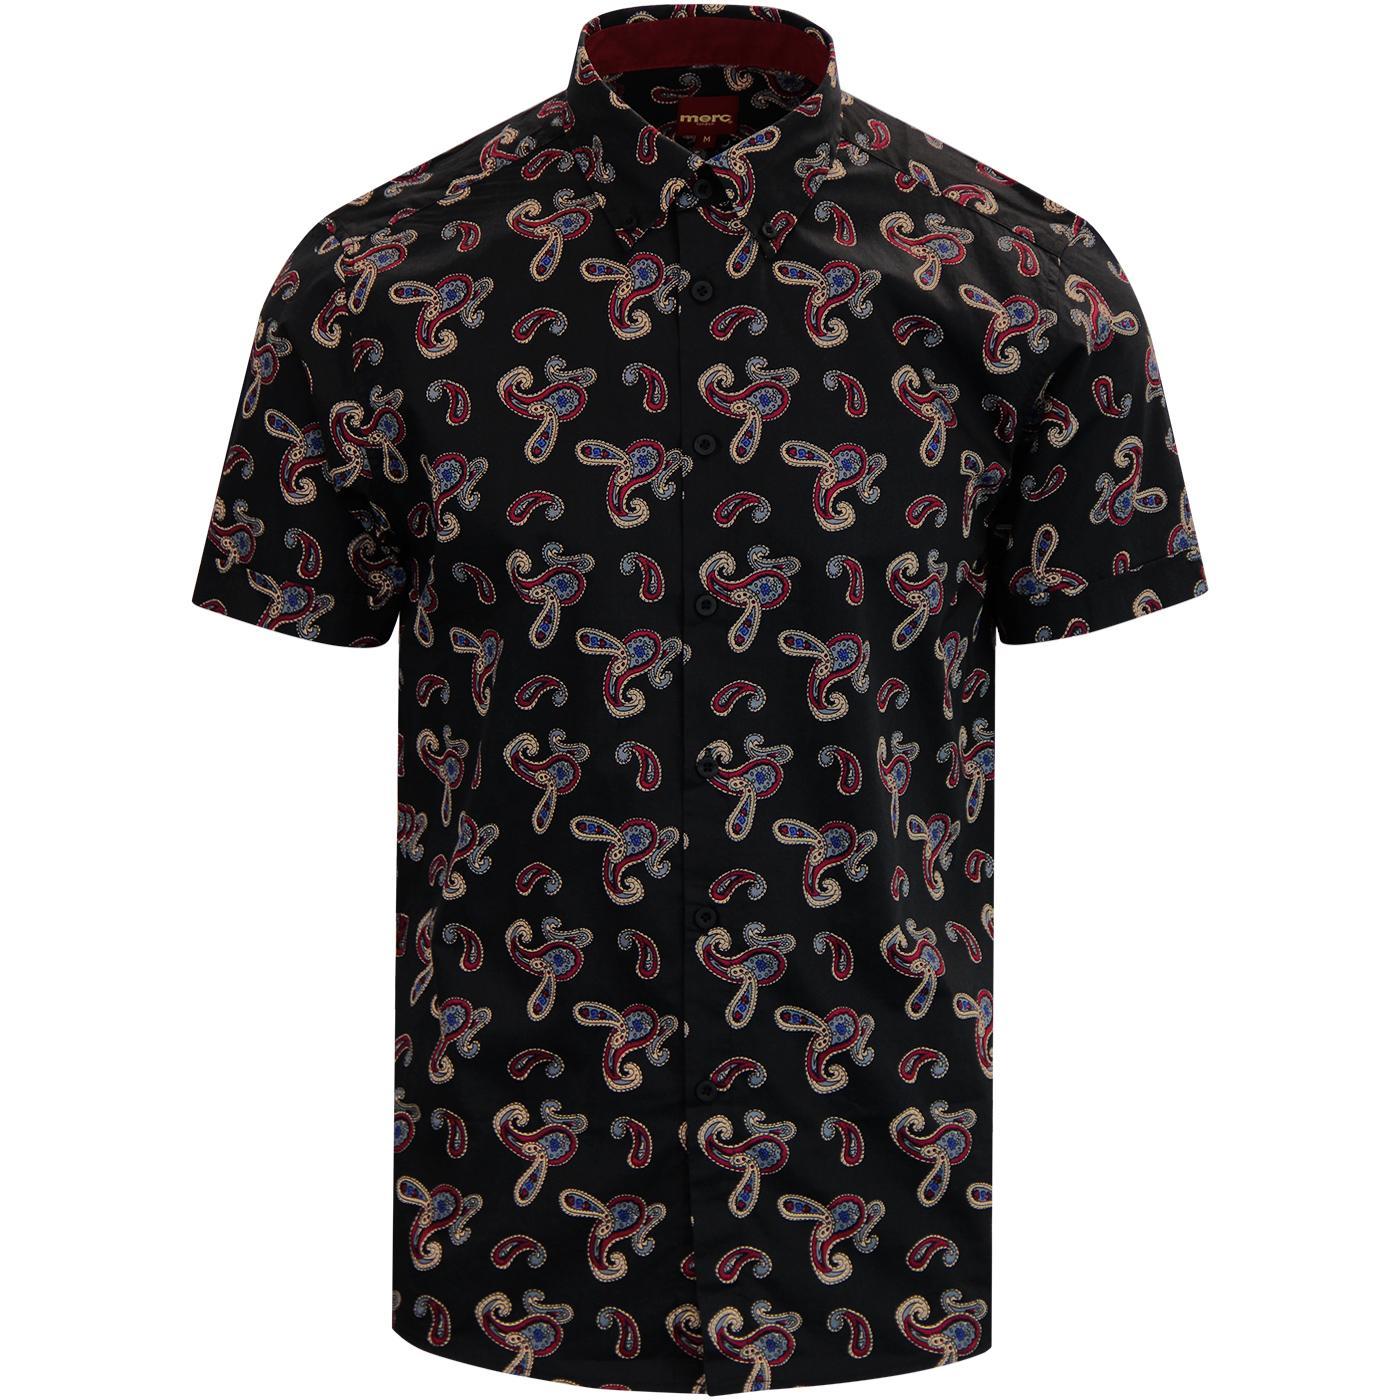 Neal MERC Retro 60s Mod S/S Paisley Shirt BLACK